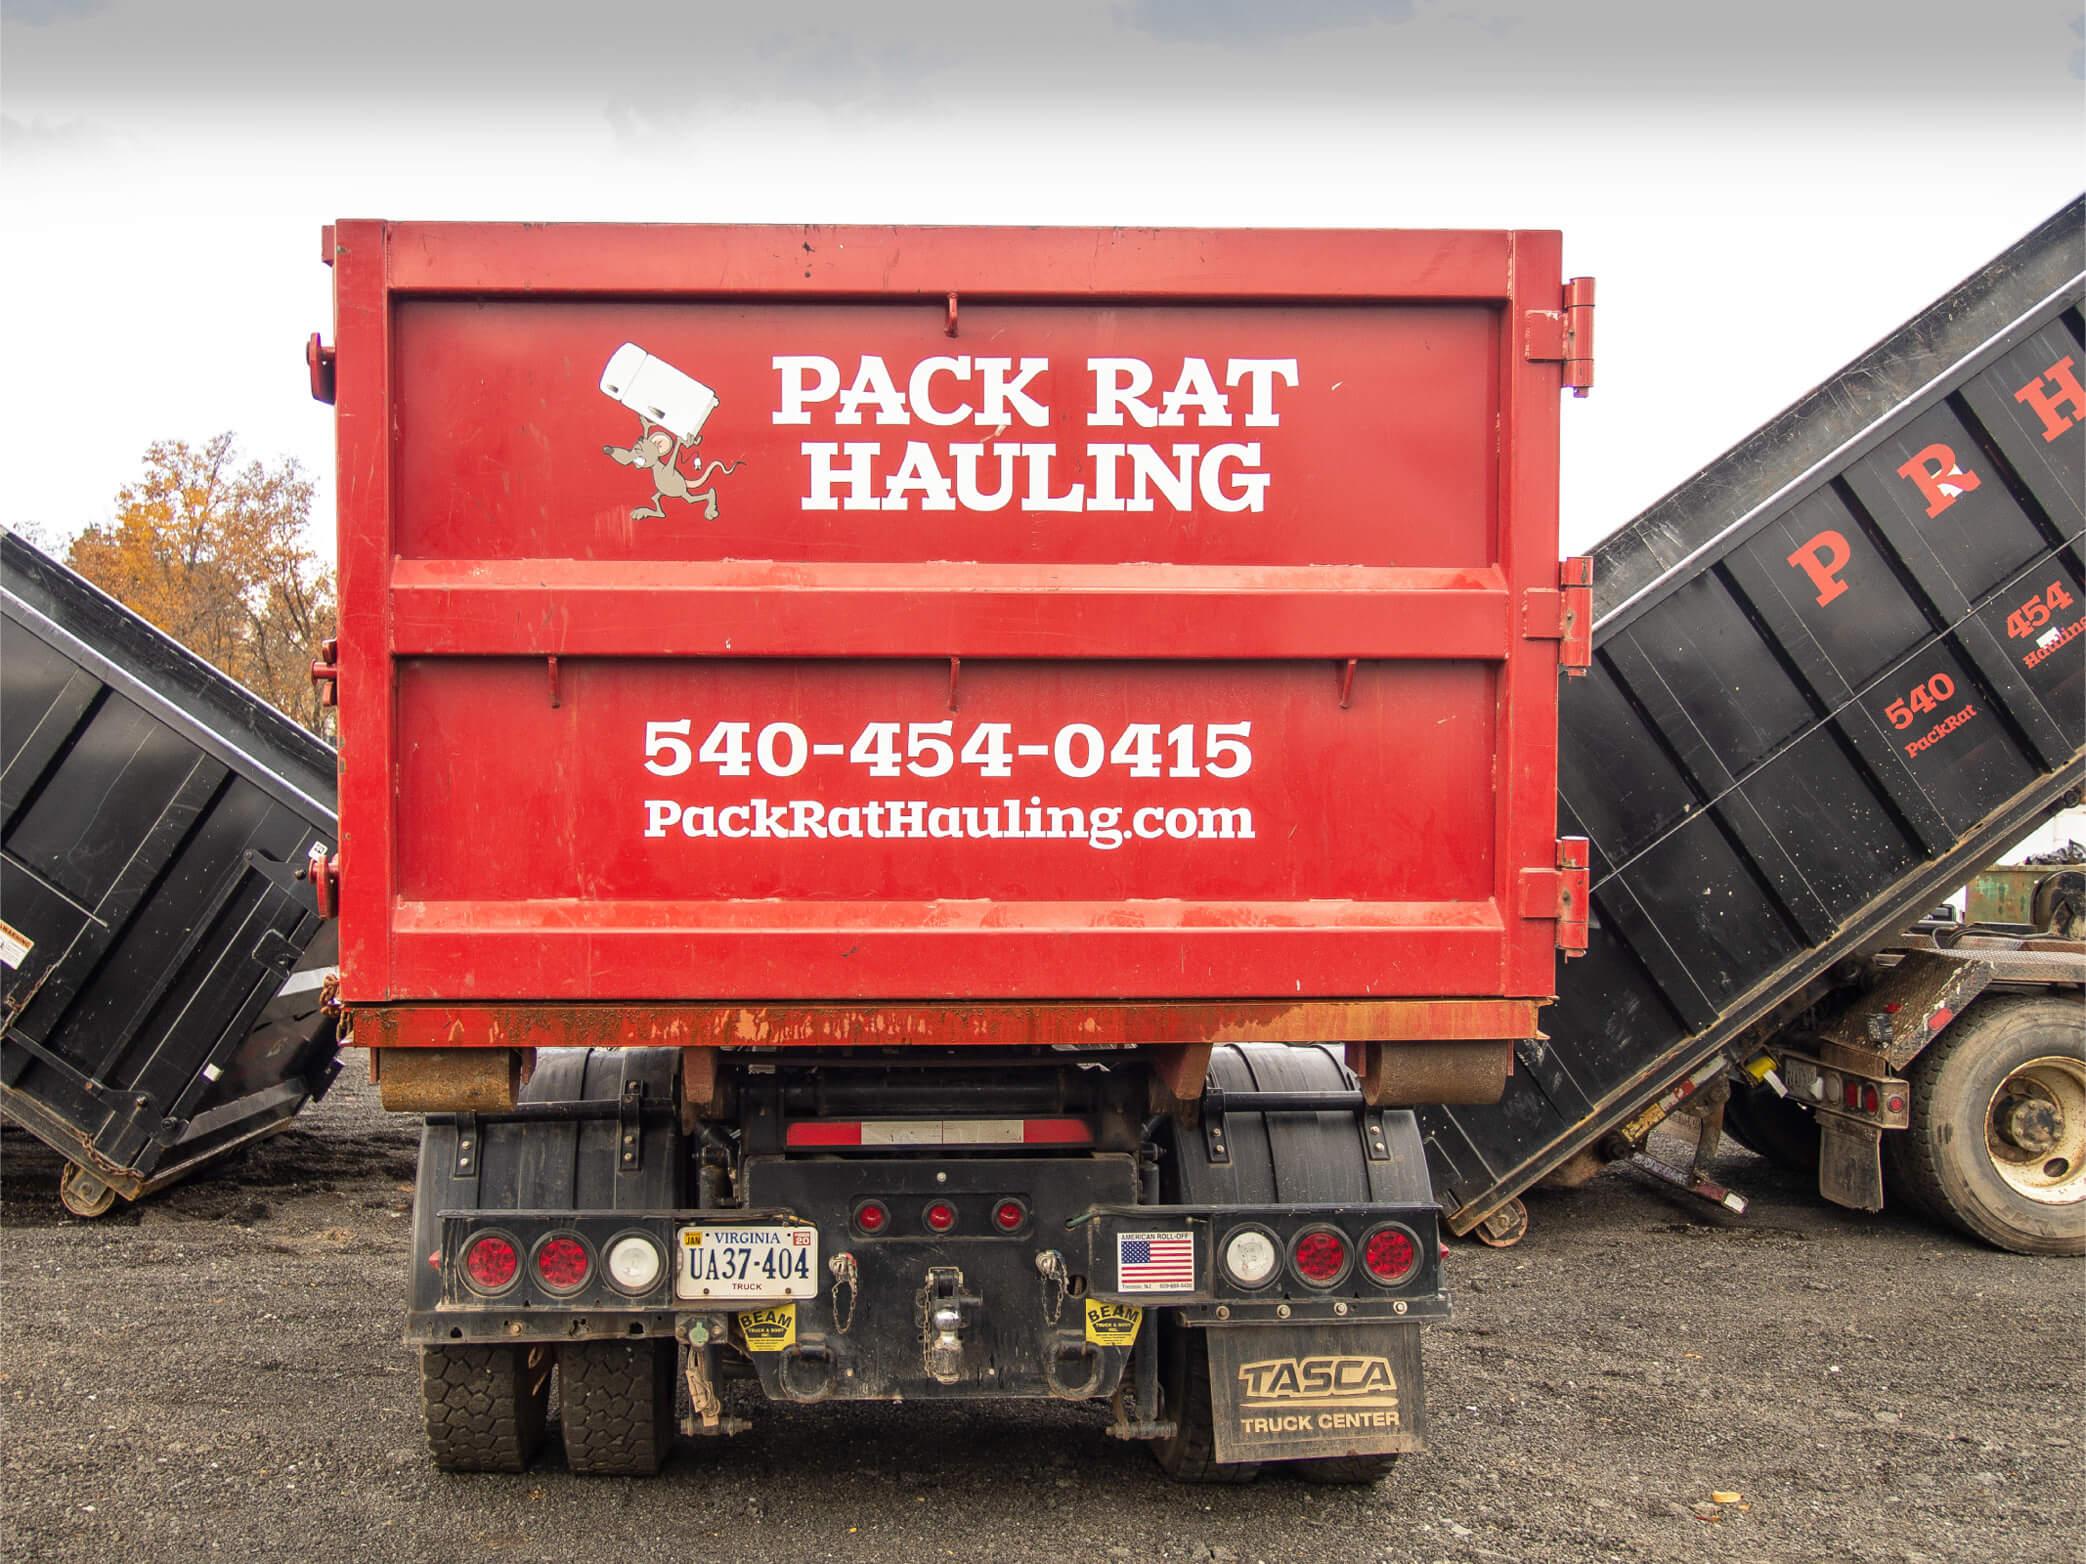 Pack Rat Hauling Website Image